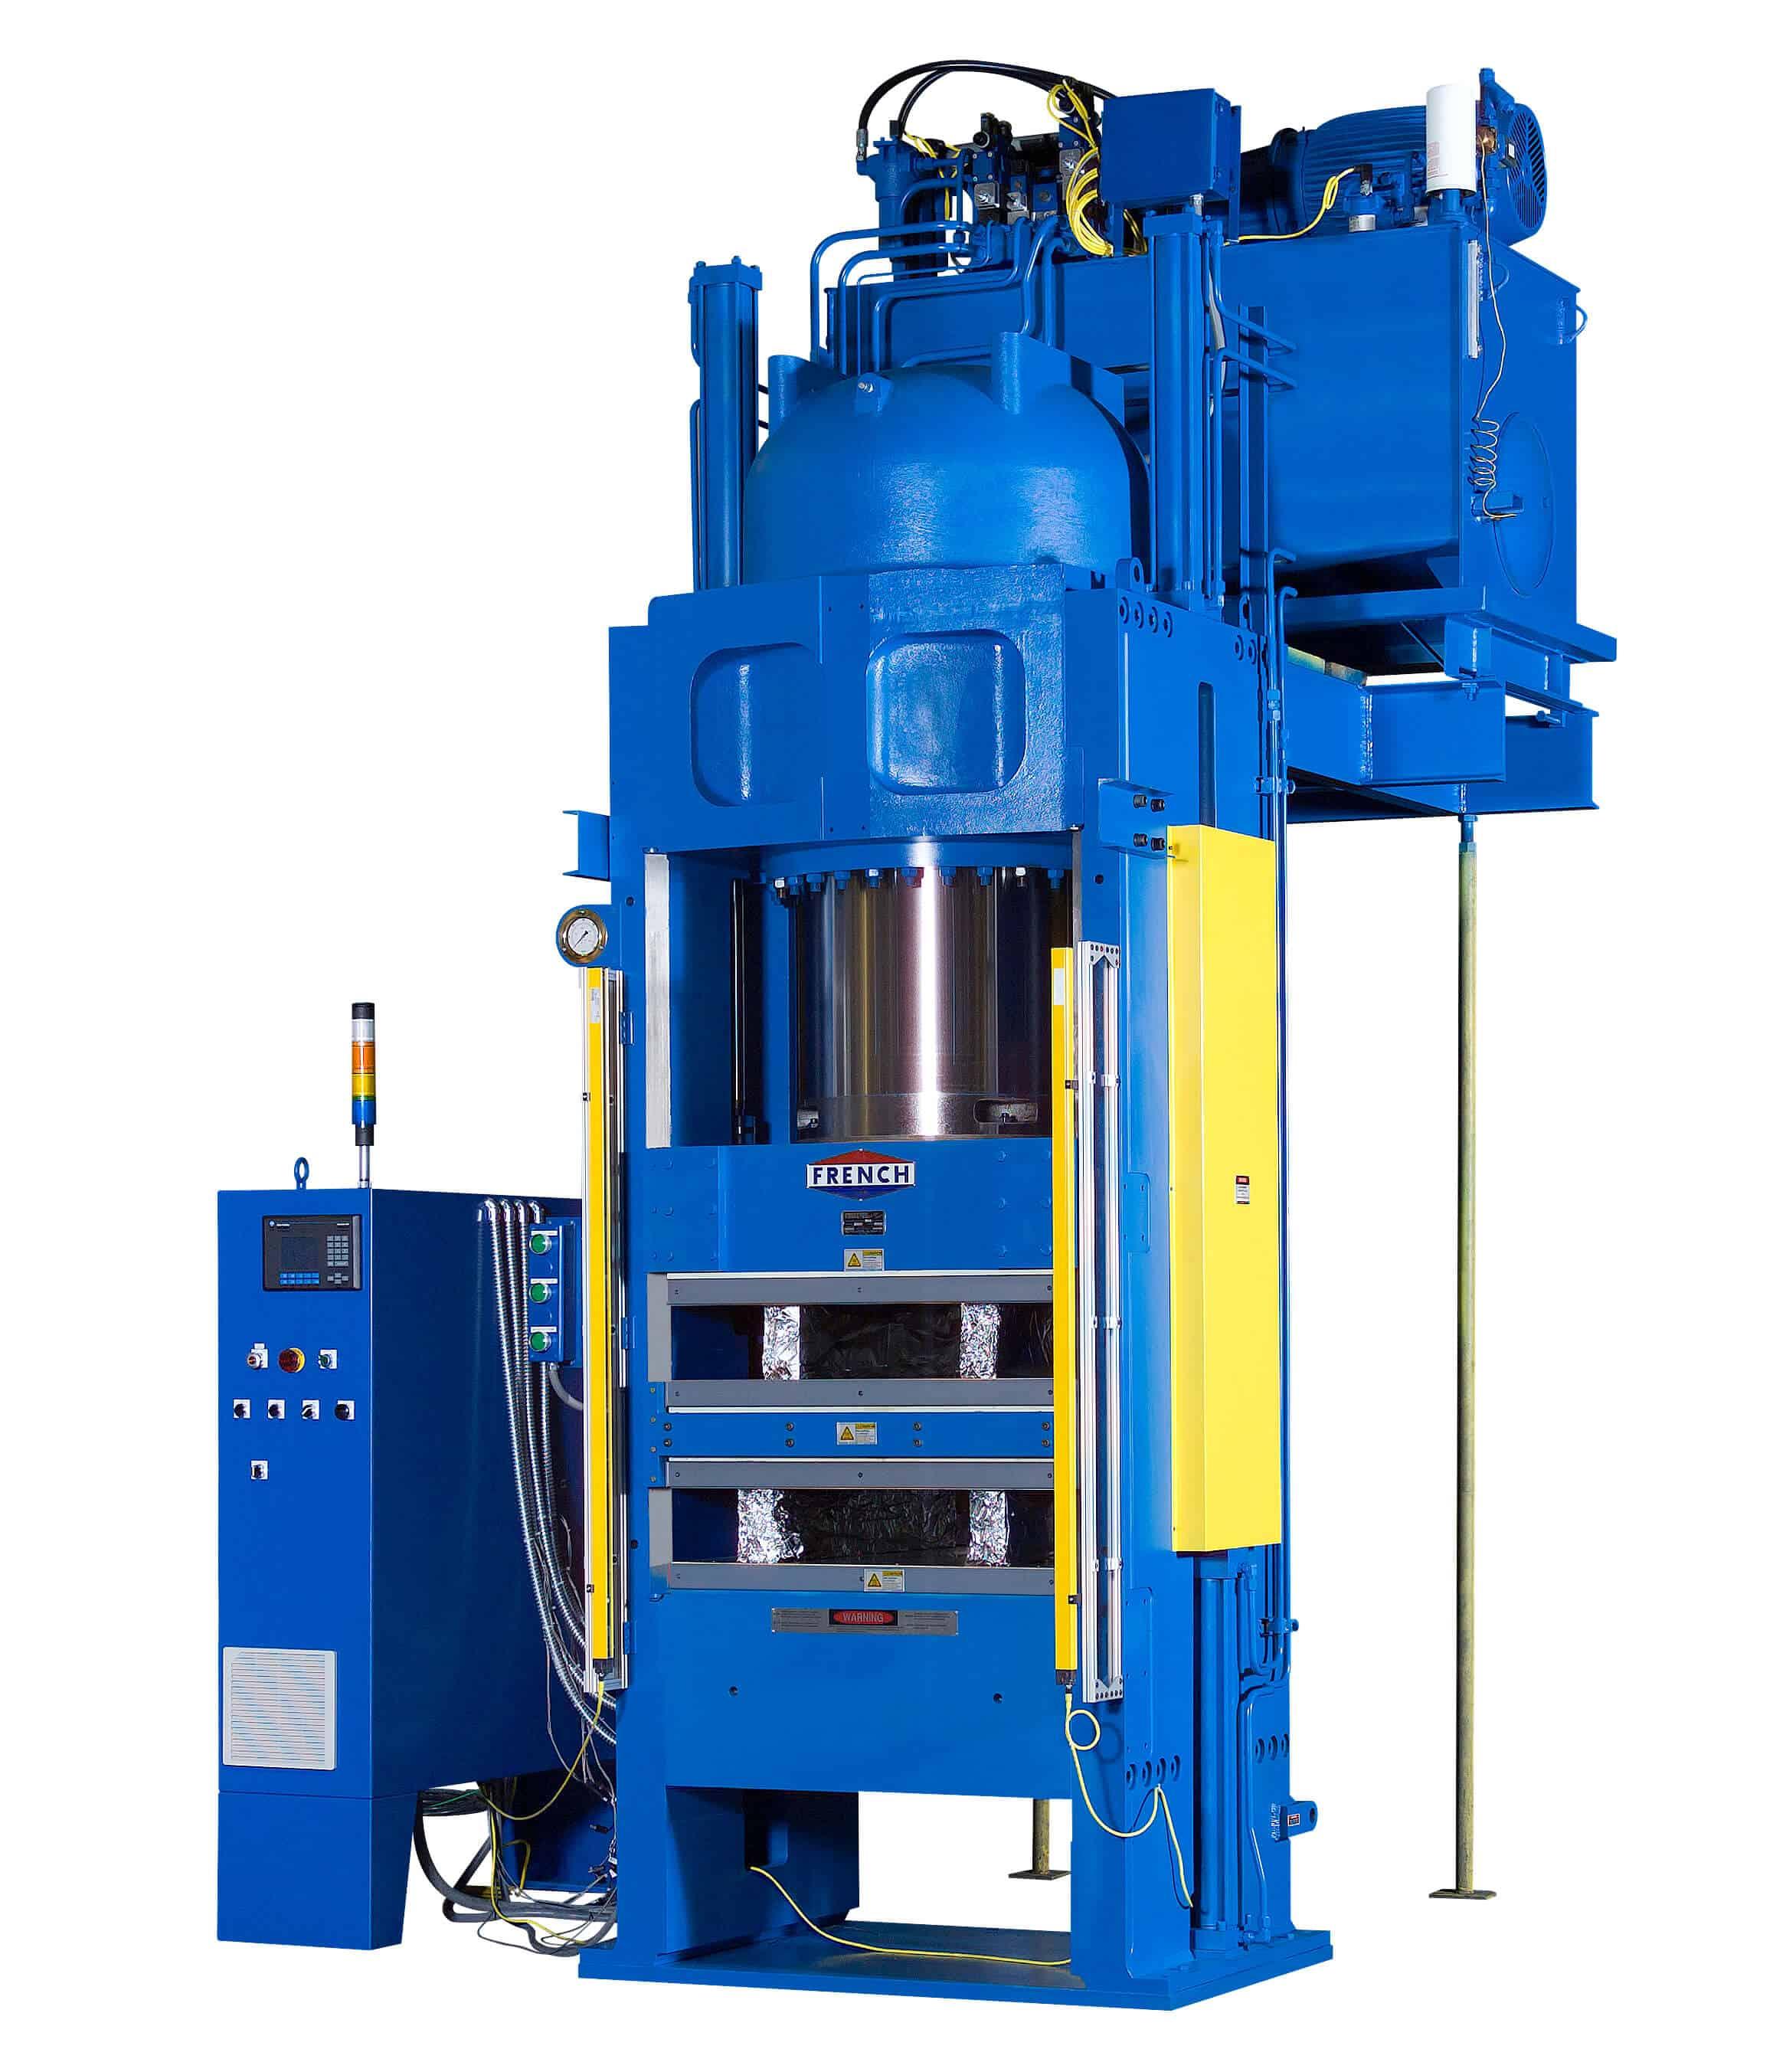 850 Ton Hydraulic Press for Medical Molding